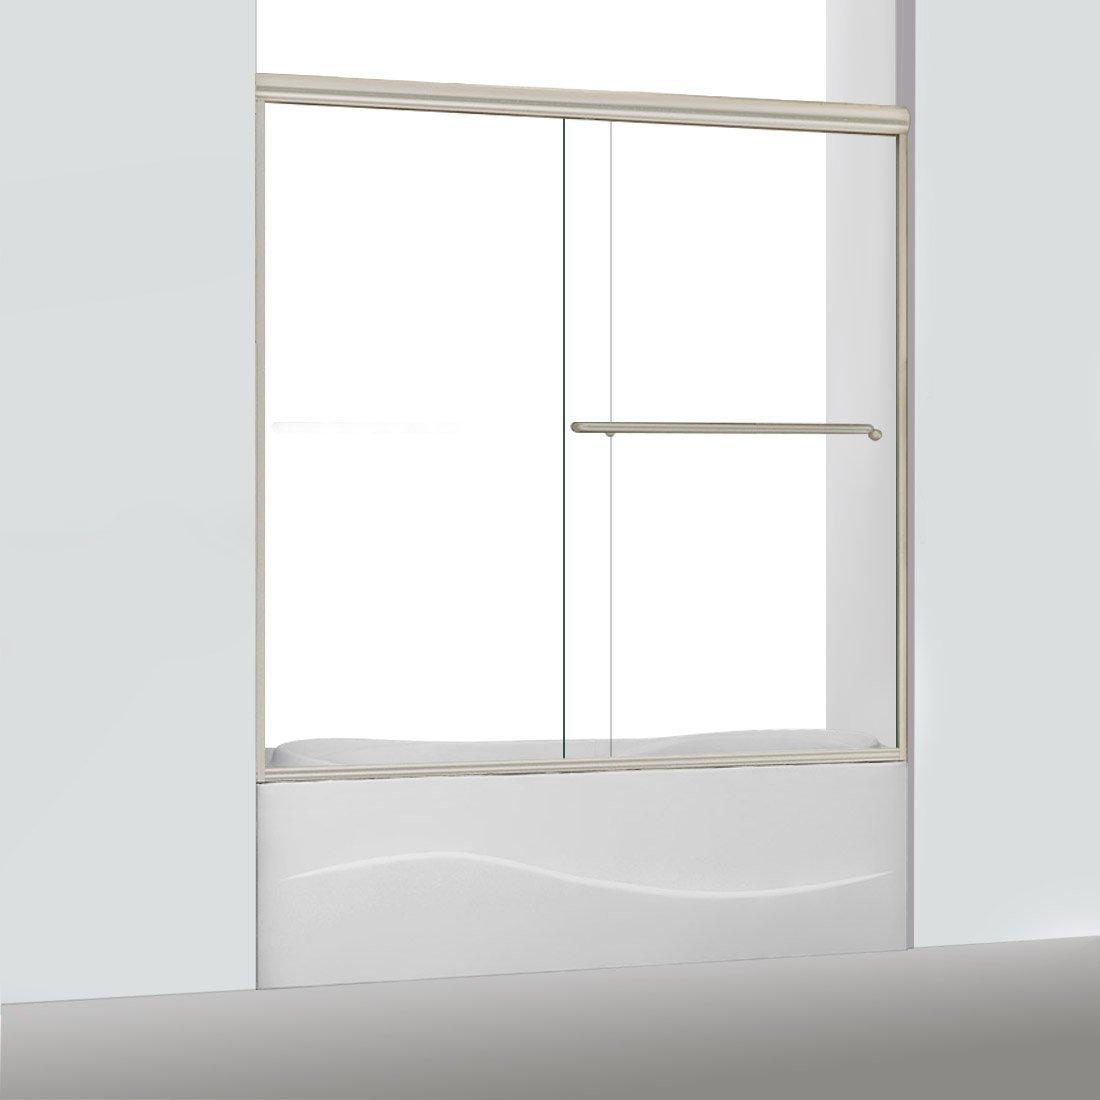 60 x 62 ELEGANT Bypass Sliding Bath Tub Glass Shower Door 5//16 Heavy Clear Shower Glass Panel Brushed Nickel Finish